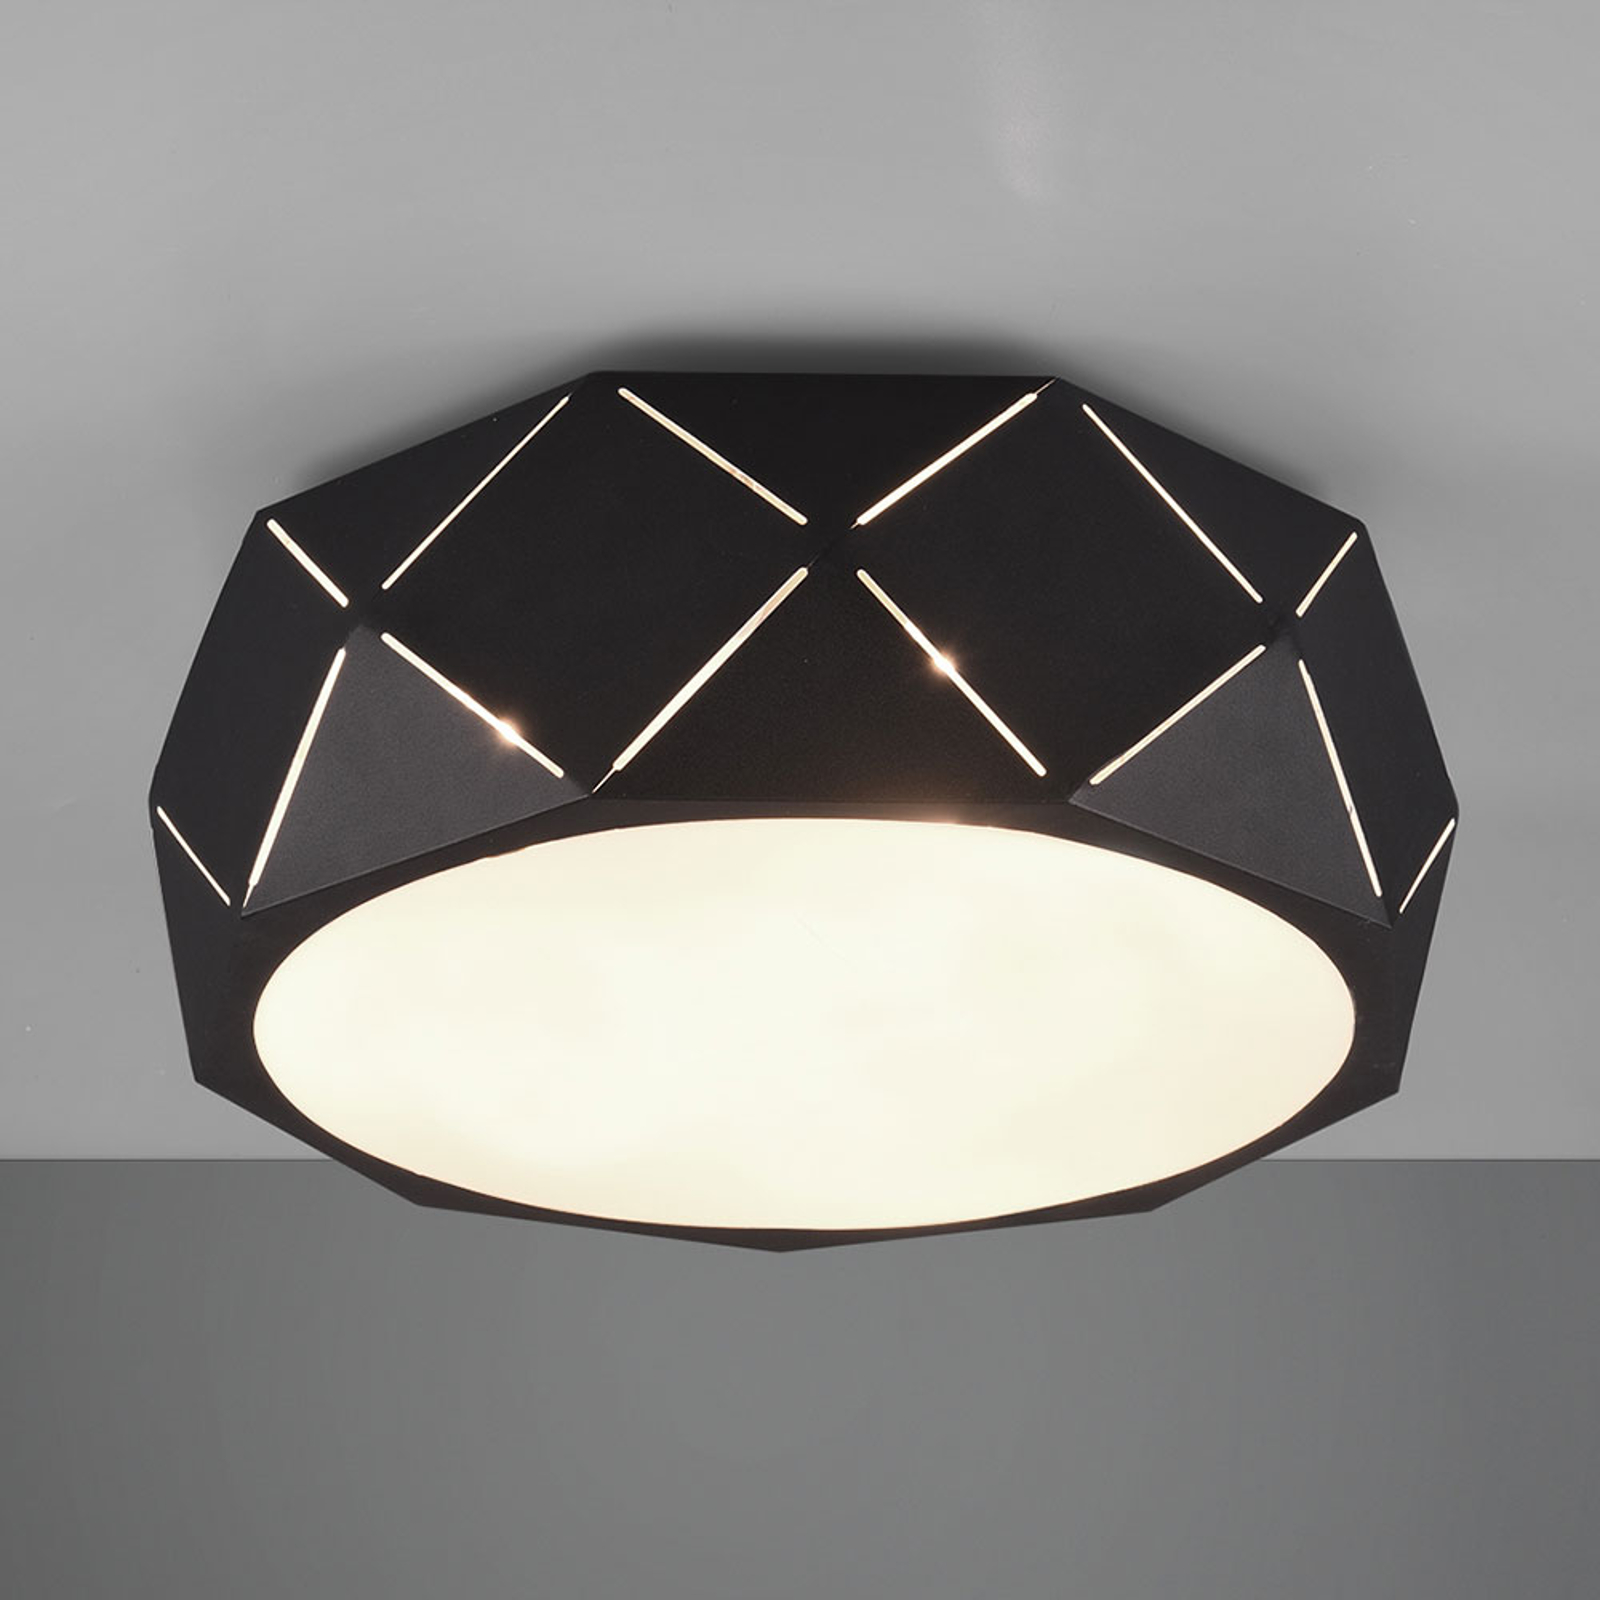 Plafondlamp Zandor met zwarte kap